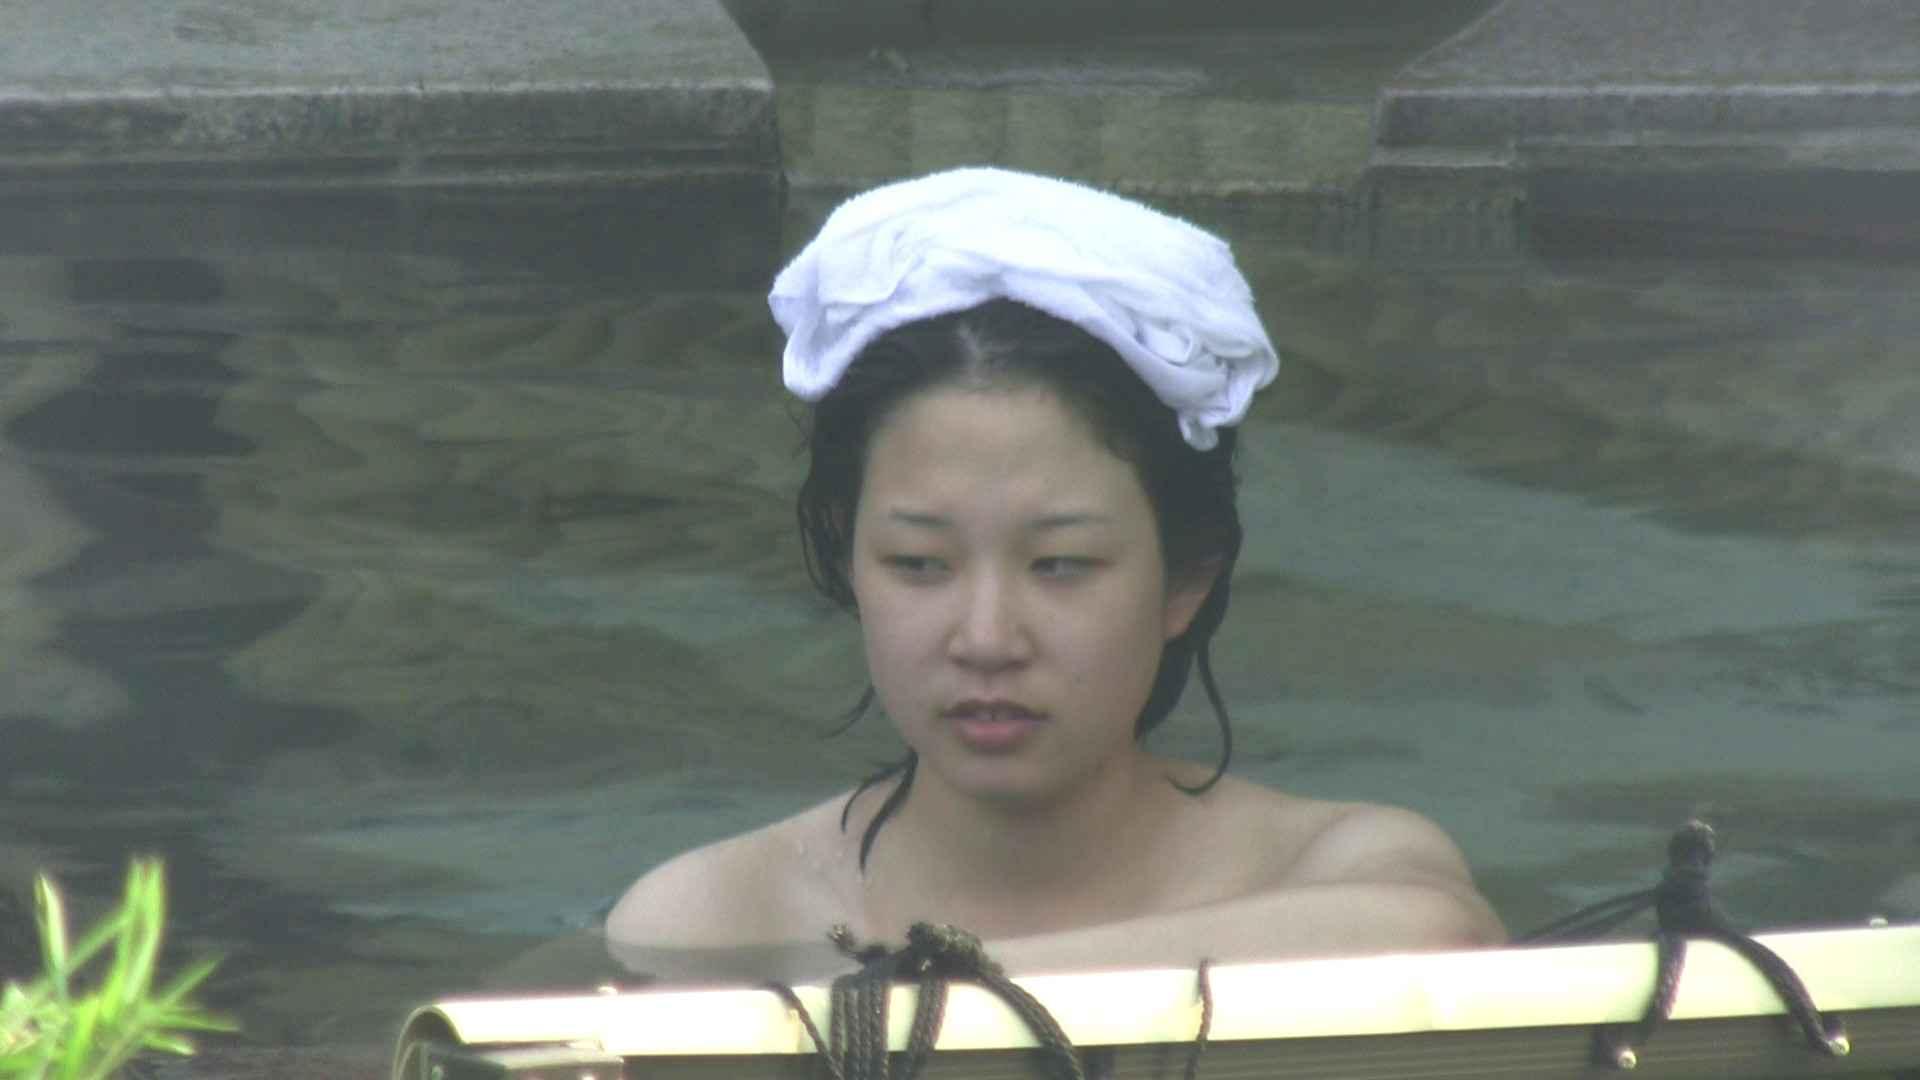 Aquaな露天風呂Vol.172 盗撮   HなOL  55pic 18